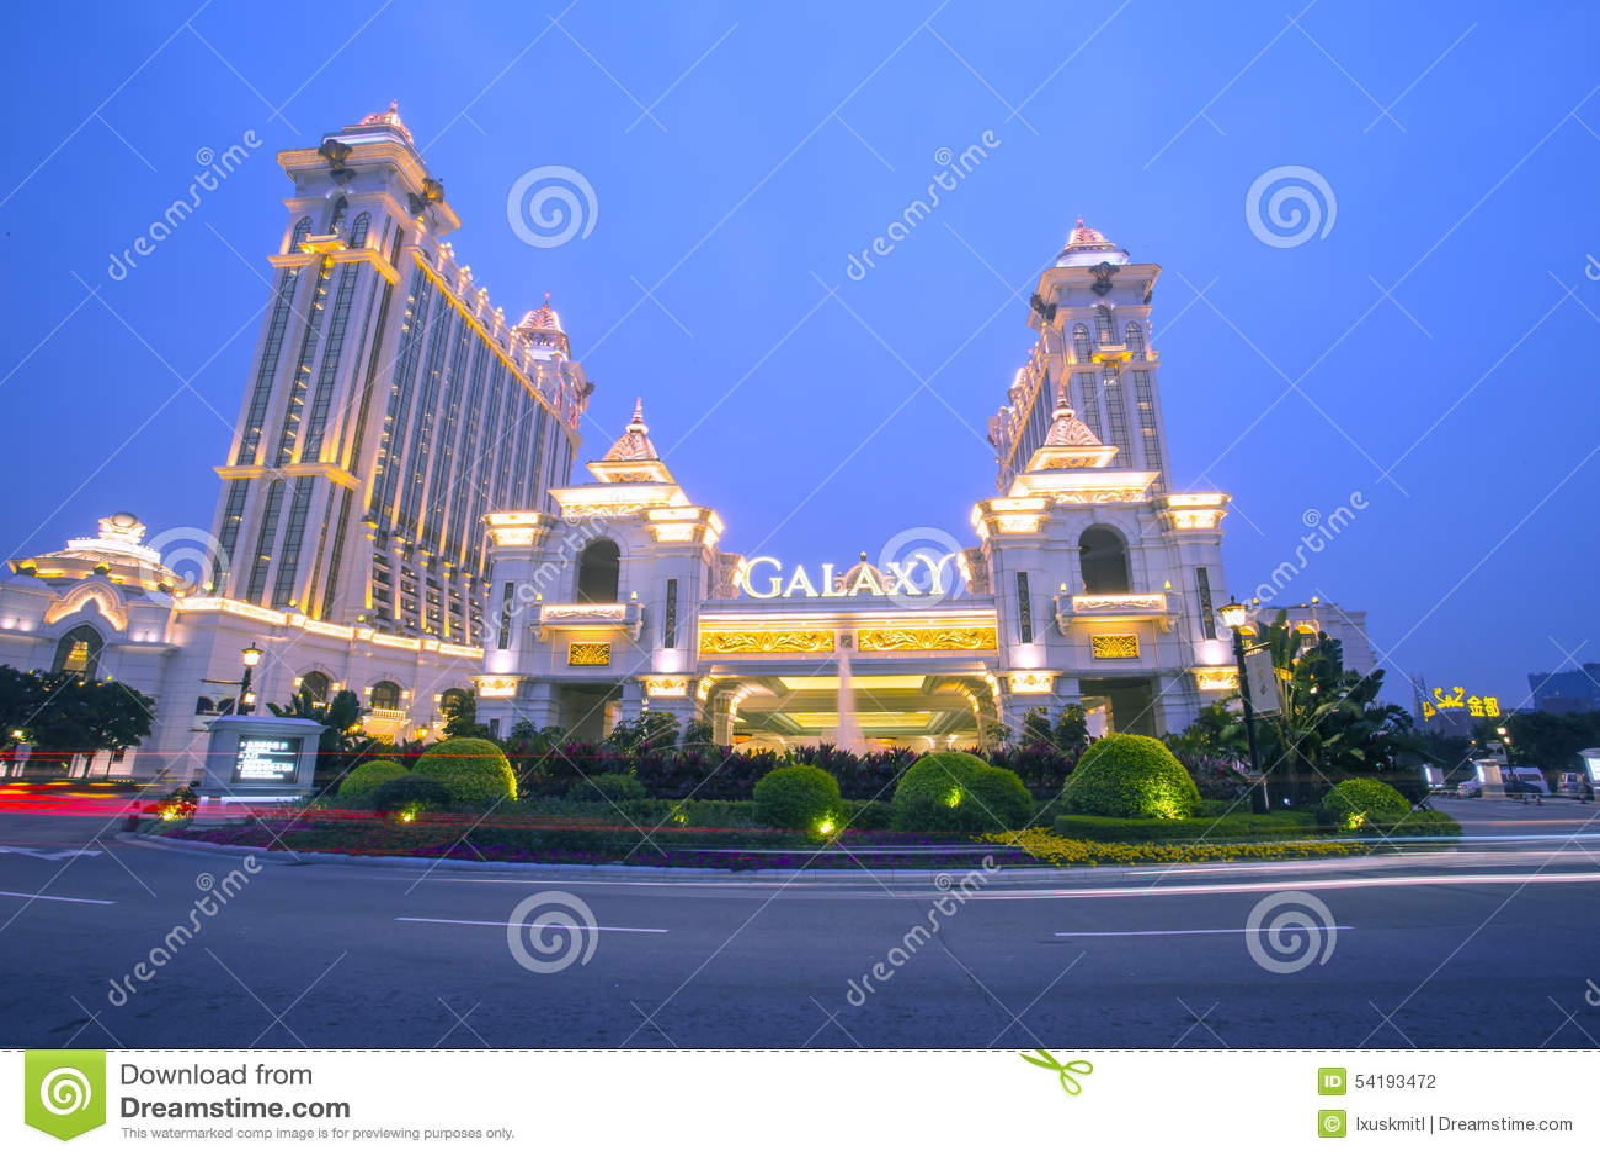 Ladbrokes Mobile Casino Promo Code